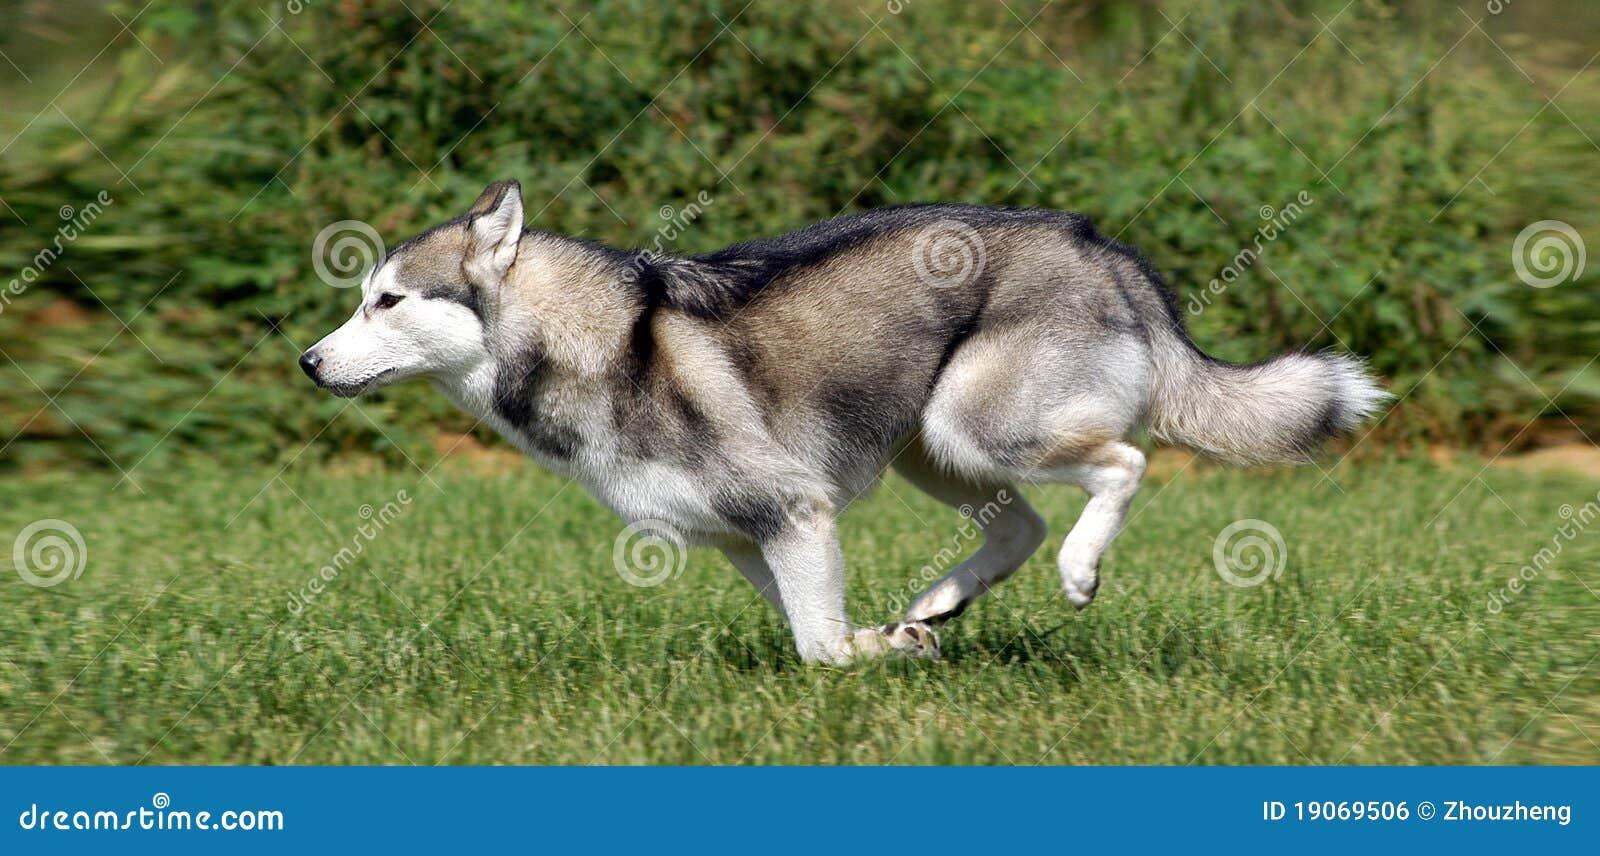 Siberian Husky Royalty Free Stock Image Image 19069506